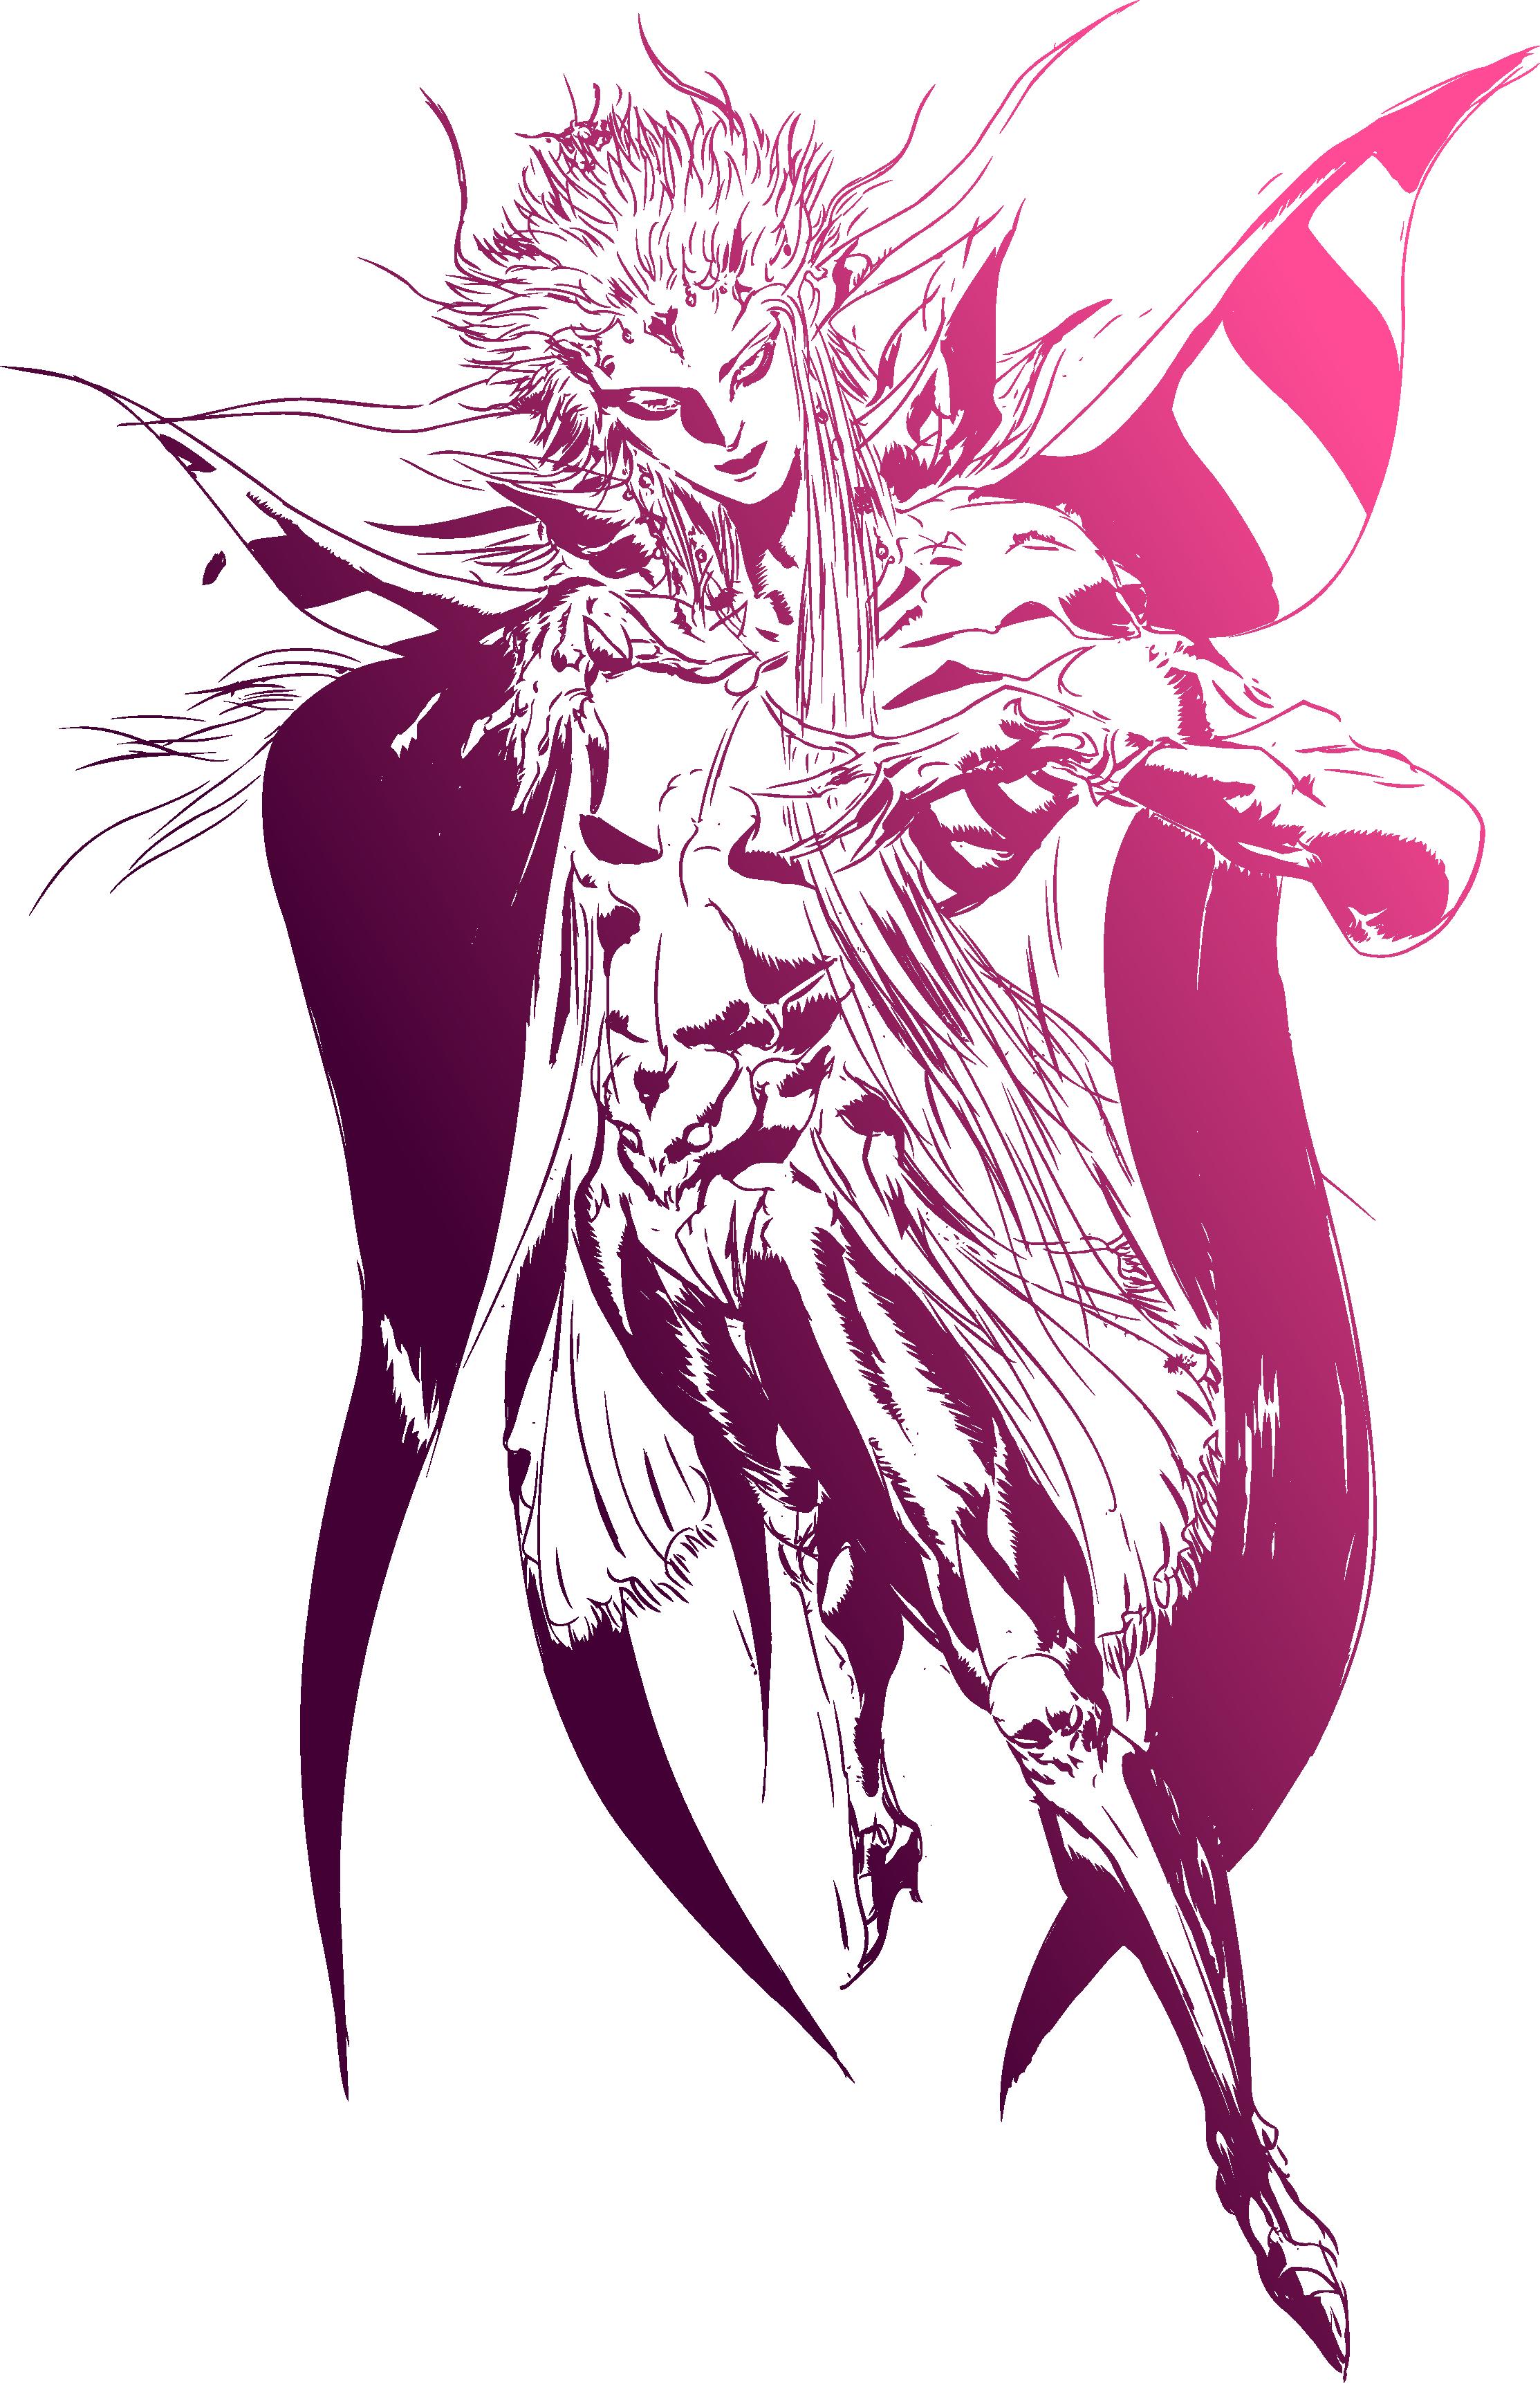 Final fantasy xii logo png - photo#40